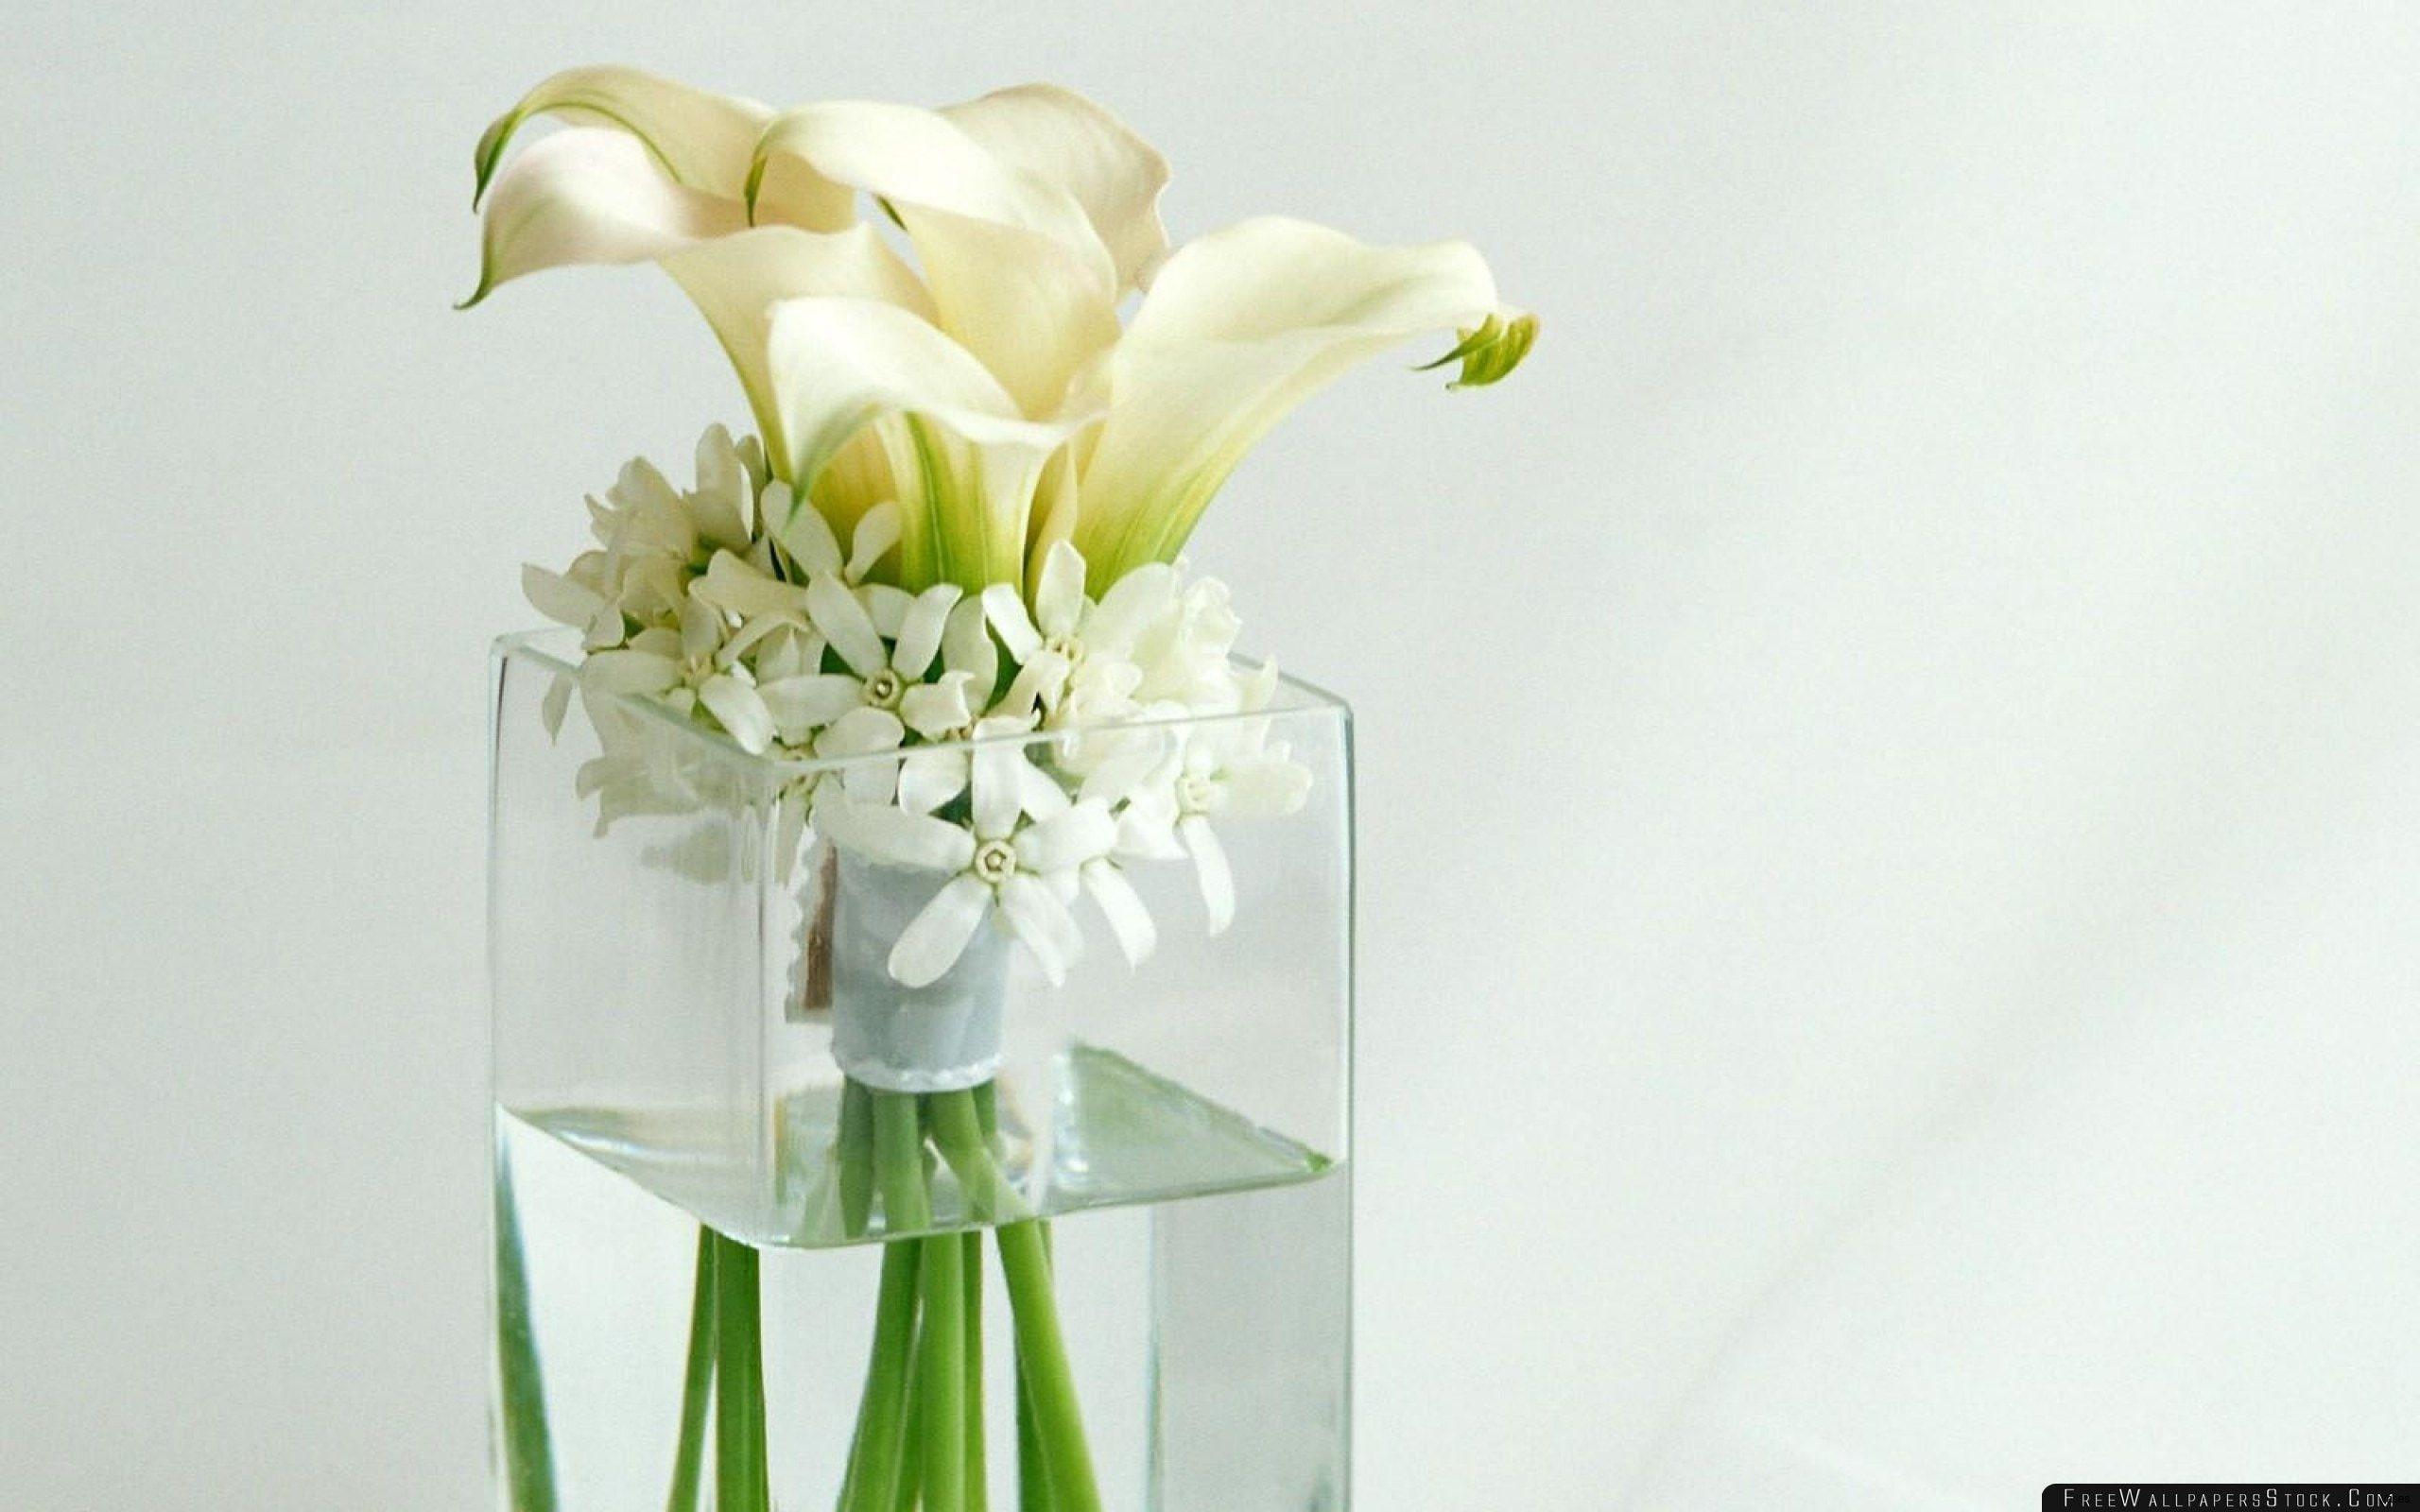 clear bud vases of flowers in glass vase new tall vase centerpiece ideas vases flowers inside flowers in glass vase new tall vase centerpiece ideas vases flowers in water 0d artificial